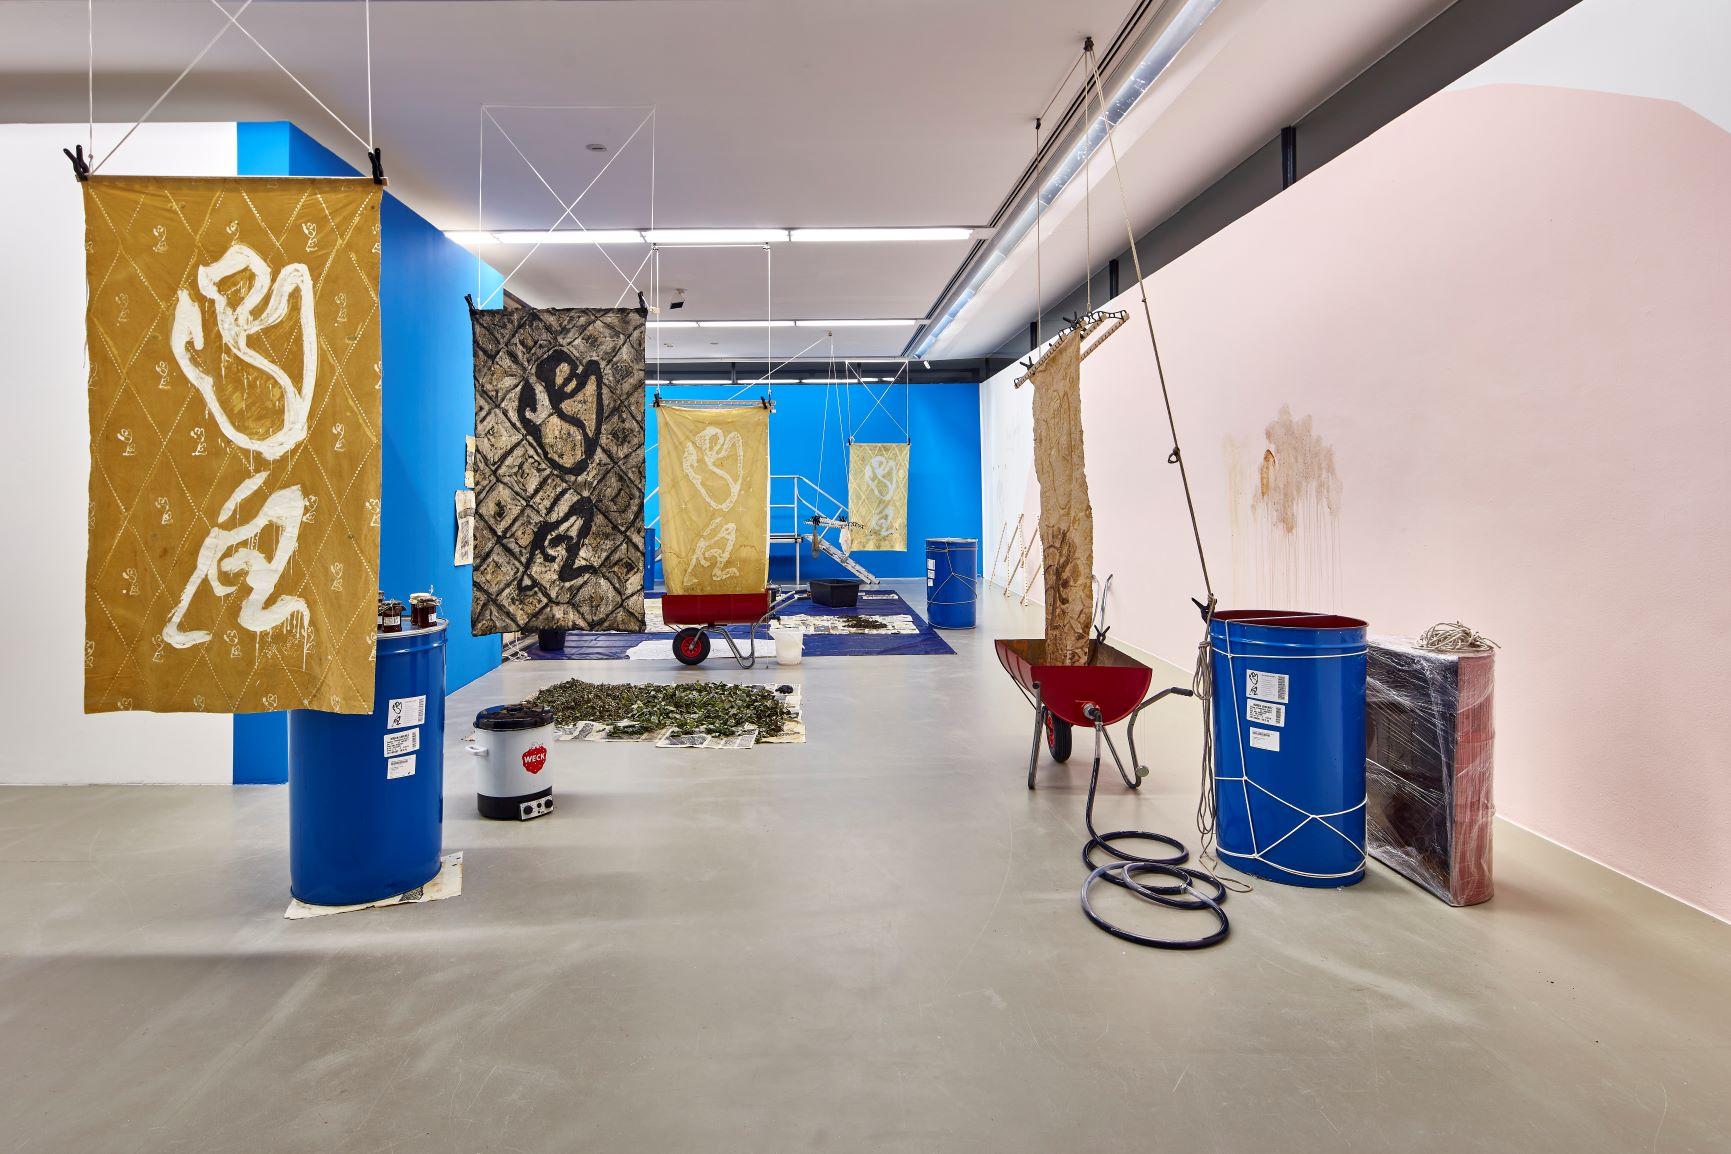 Ada van Hoorebeke, Rose Family Factory, 2020, Installationsansicht Städtische Galerie Nordhorn, Foto: Helmut Claus